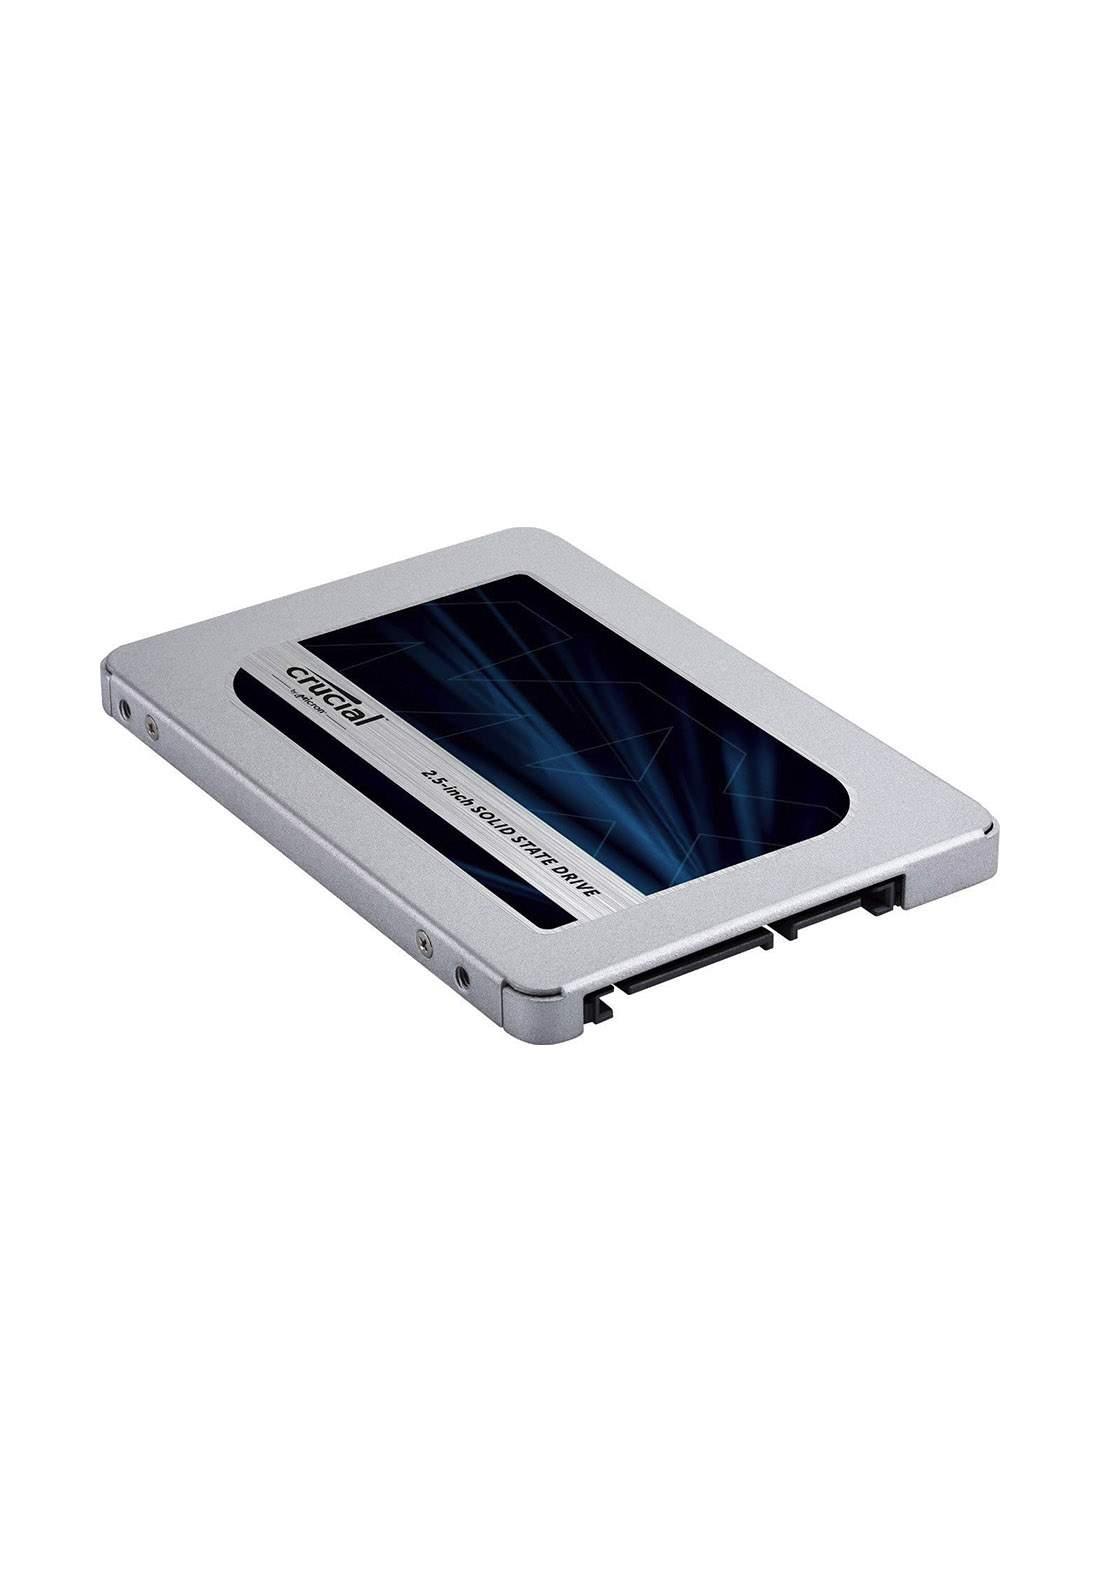 Crucial MX500 1TB 3D Nada 2.5 Inch Internal SSD-Black هارد داخلي